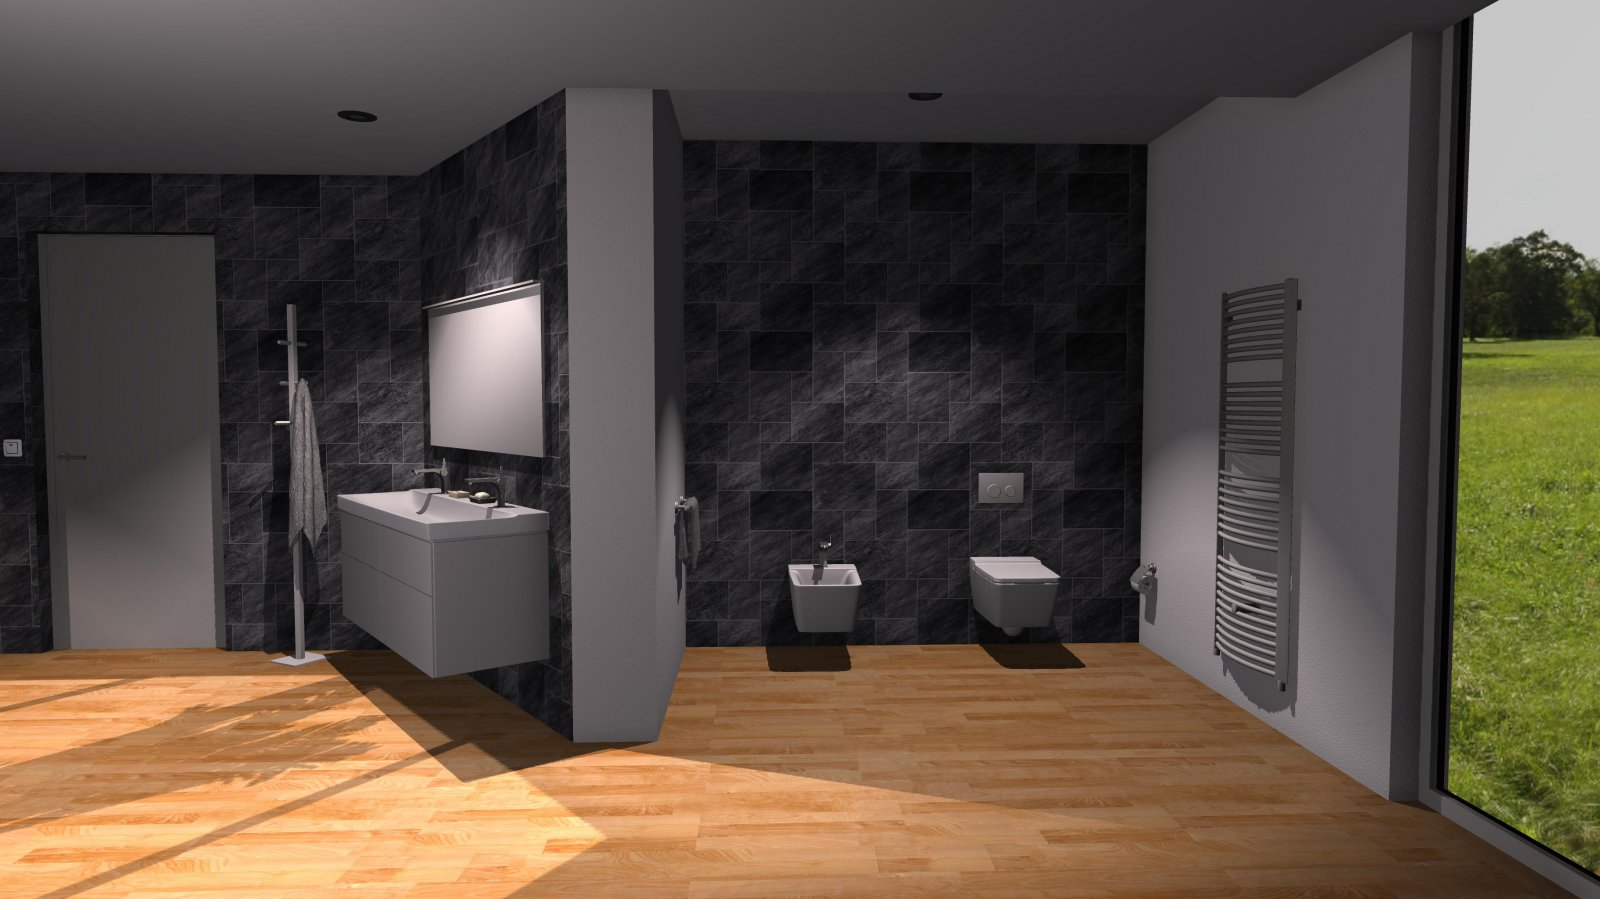 Raumplanung Keramag Design Showroom - roomeon Community